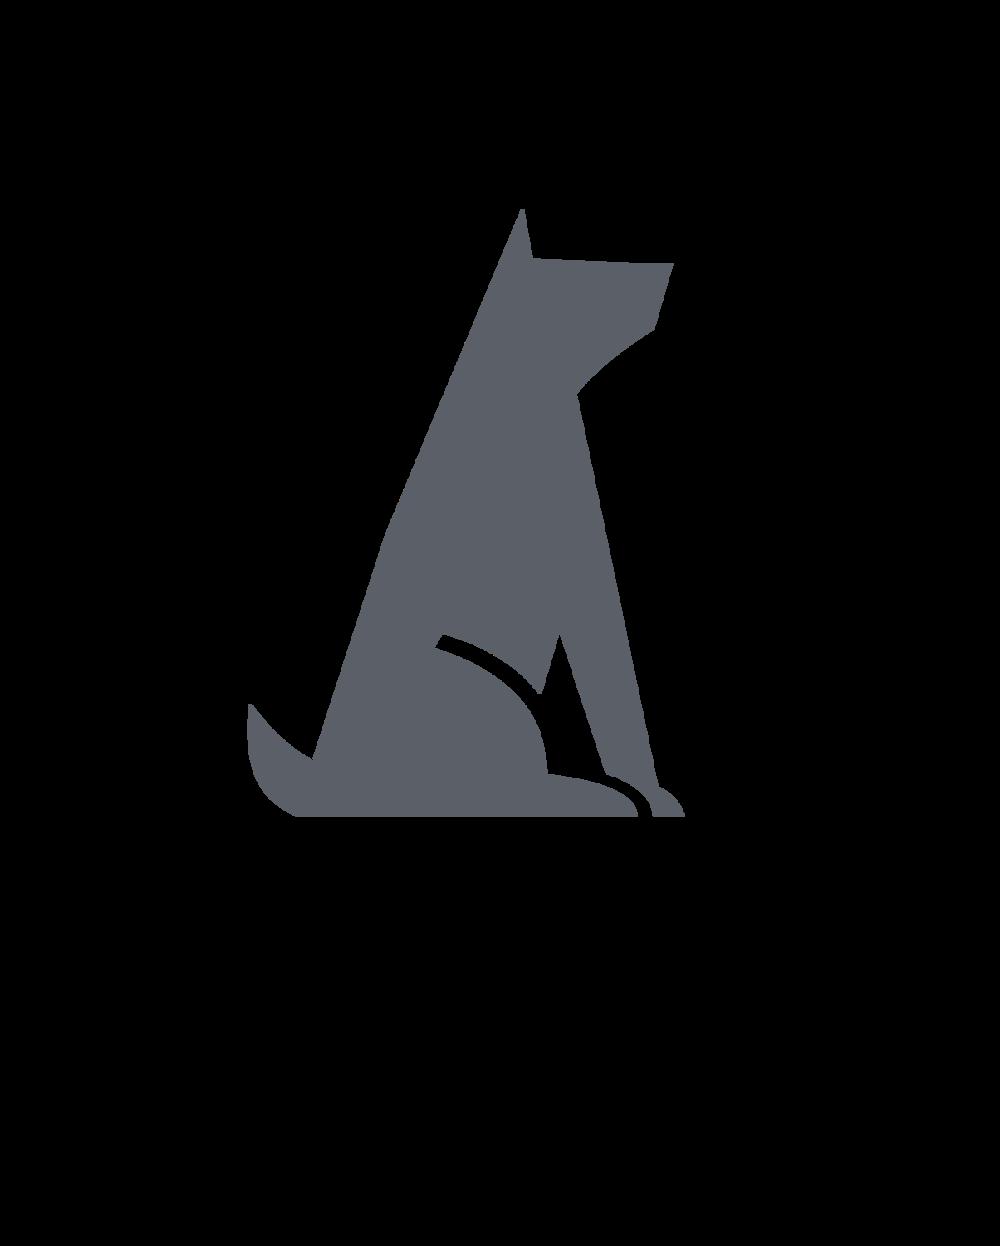 S T A R K-logomark.png